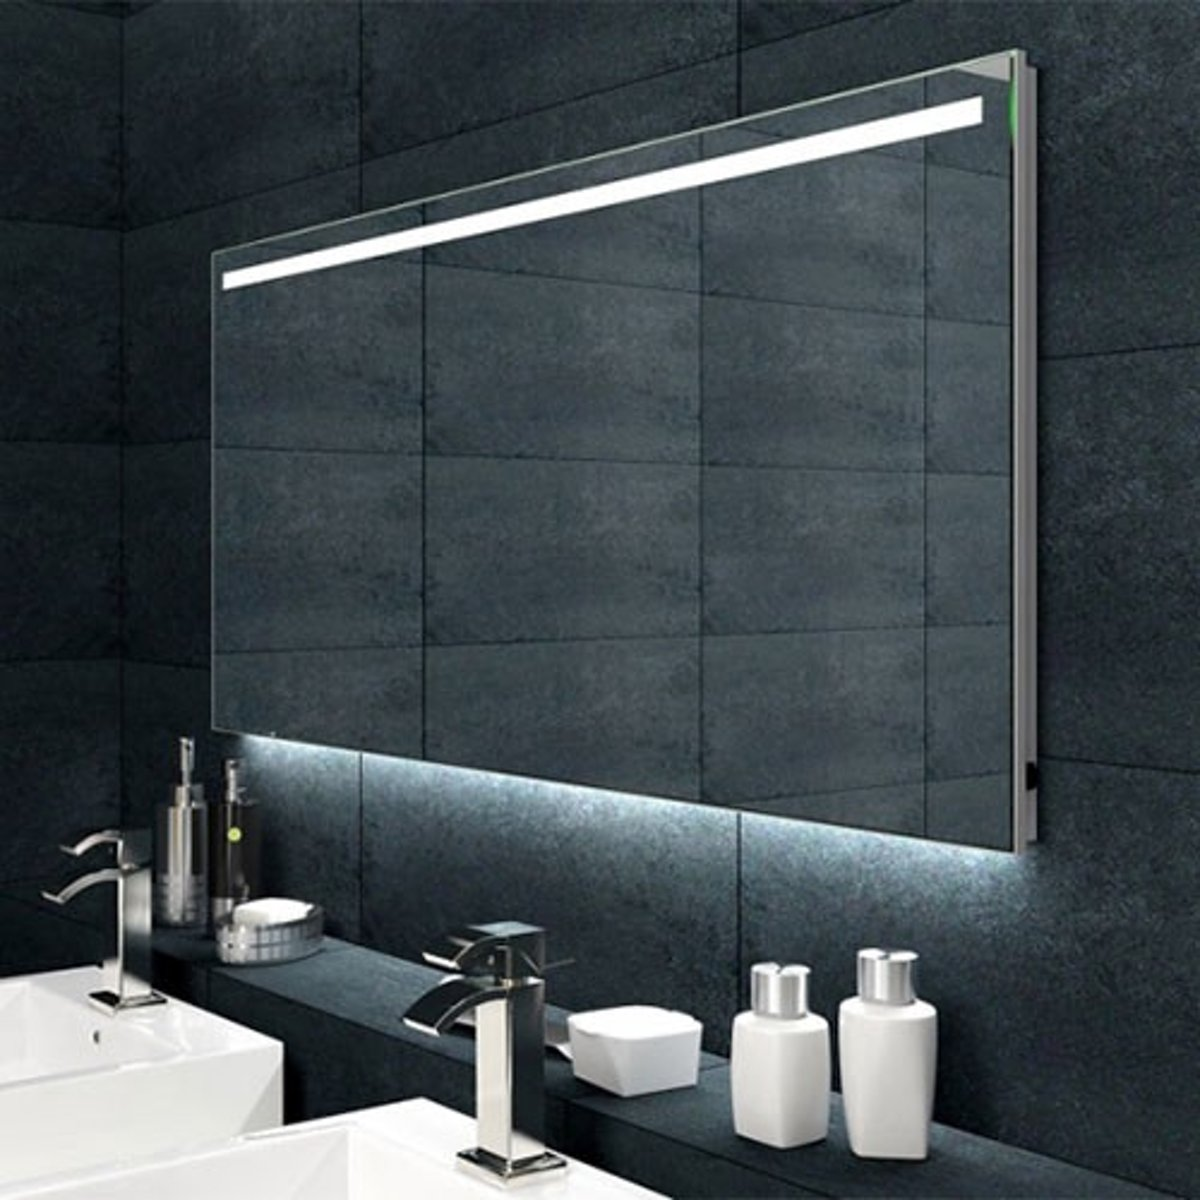 Badkamer Spiegel Met Verwarming En Verlichting.Badkamerspiegel Ambi 120x60cm Geintegreerde Led Verlichting Verwarming Anti Condens Met Lichtschakelaar